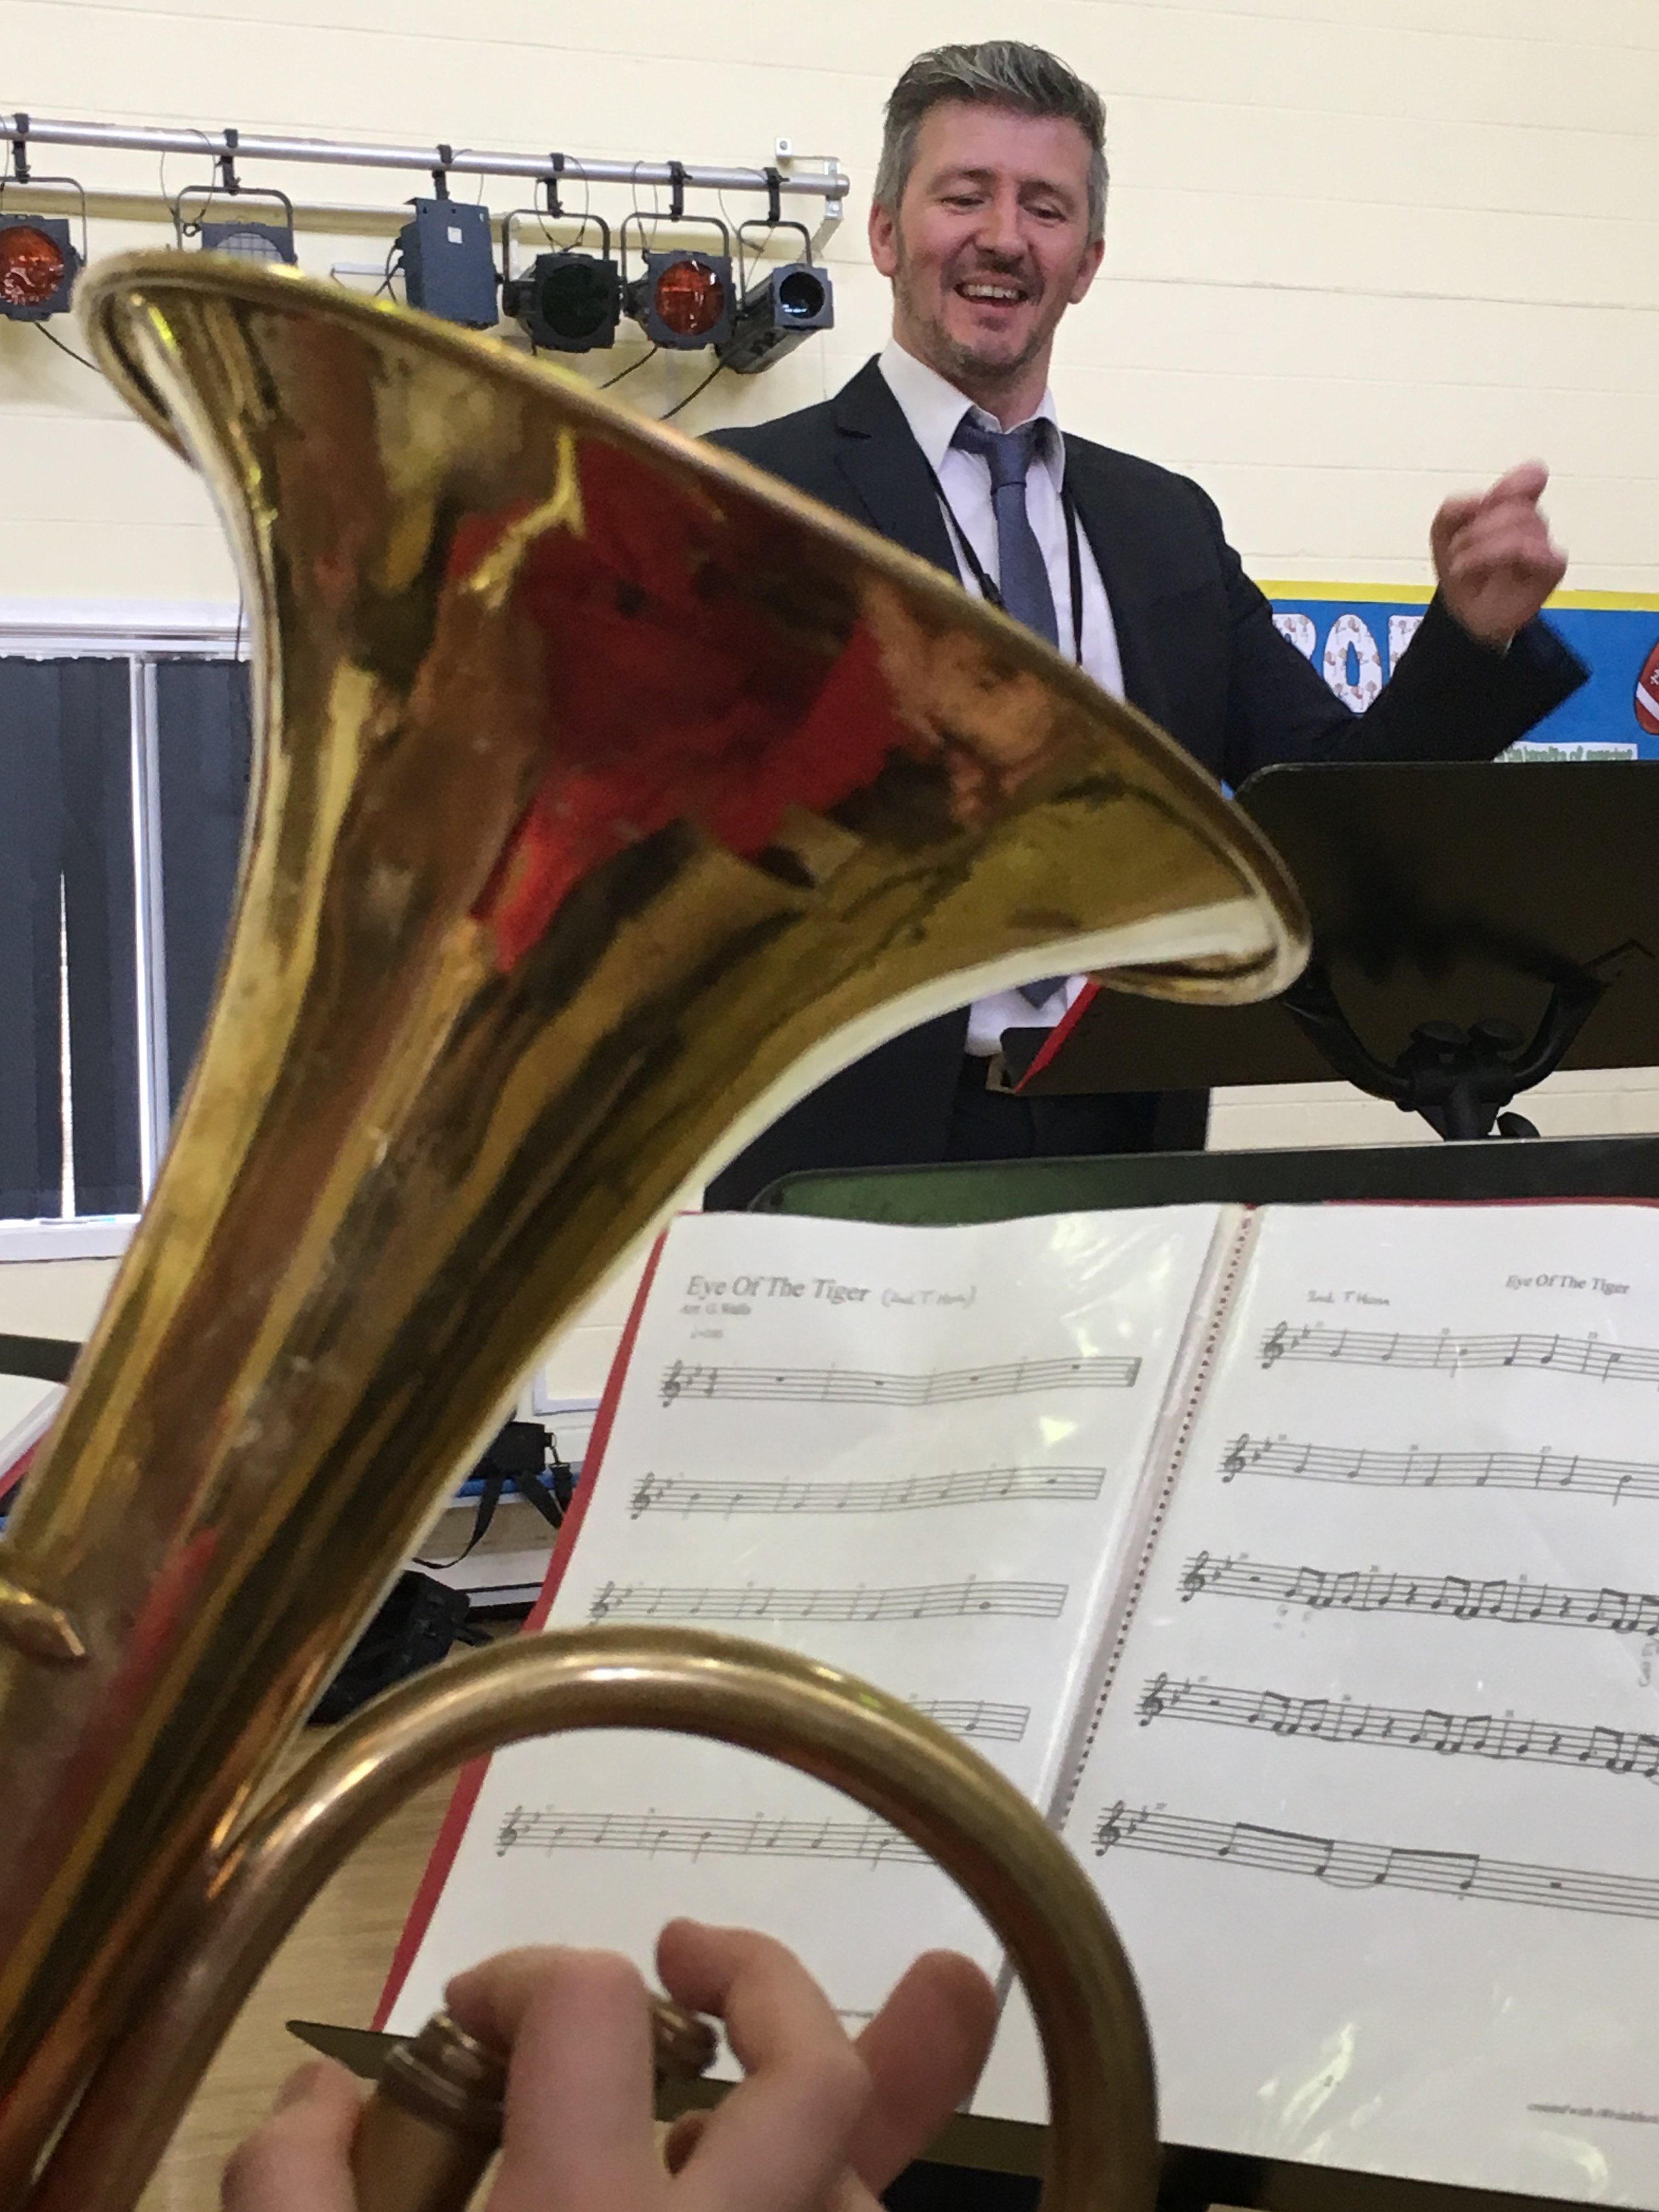 Garry Walls conducting